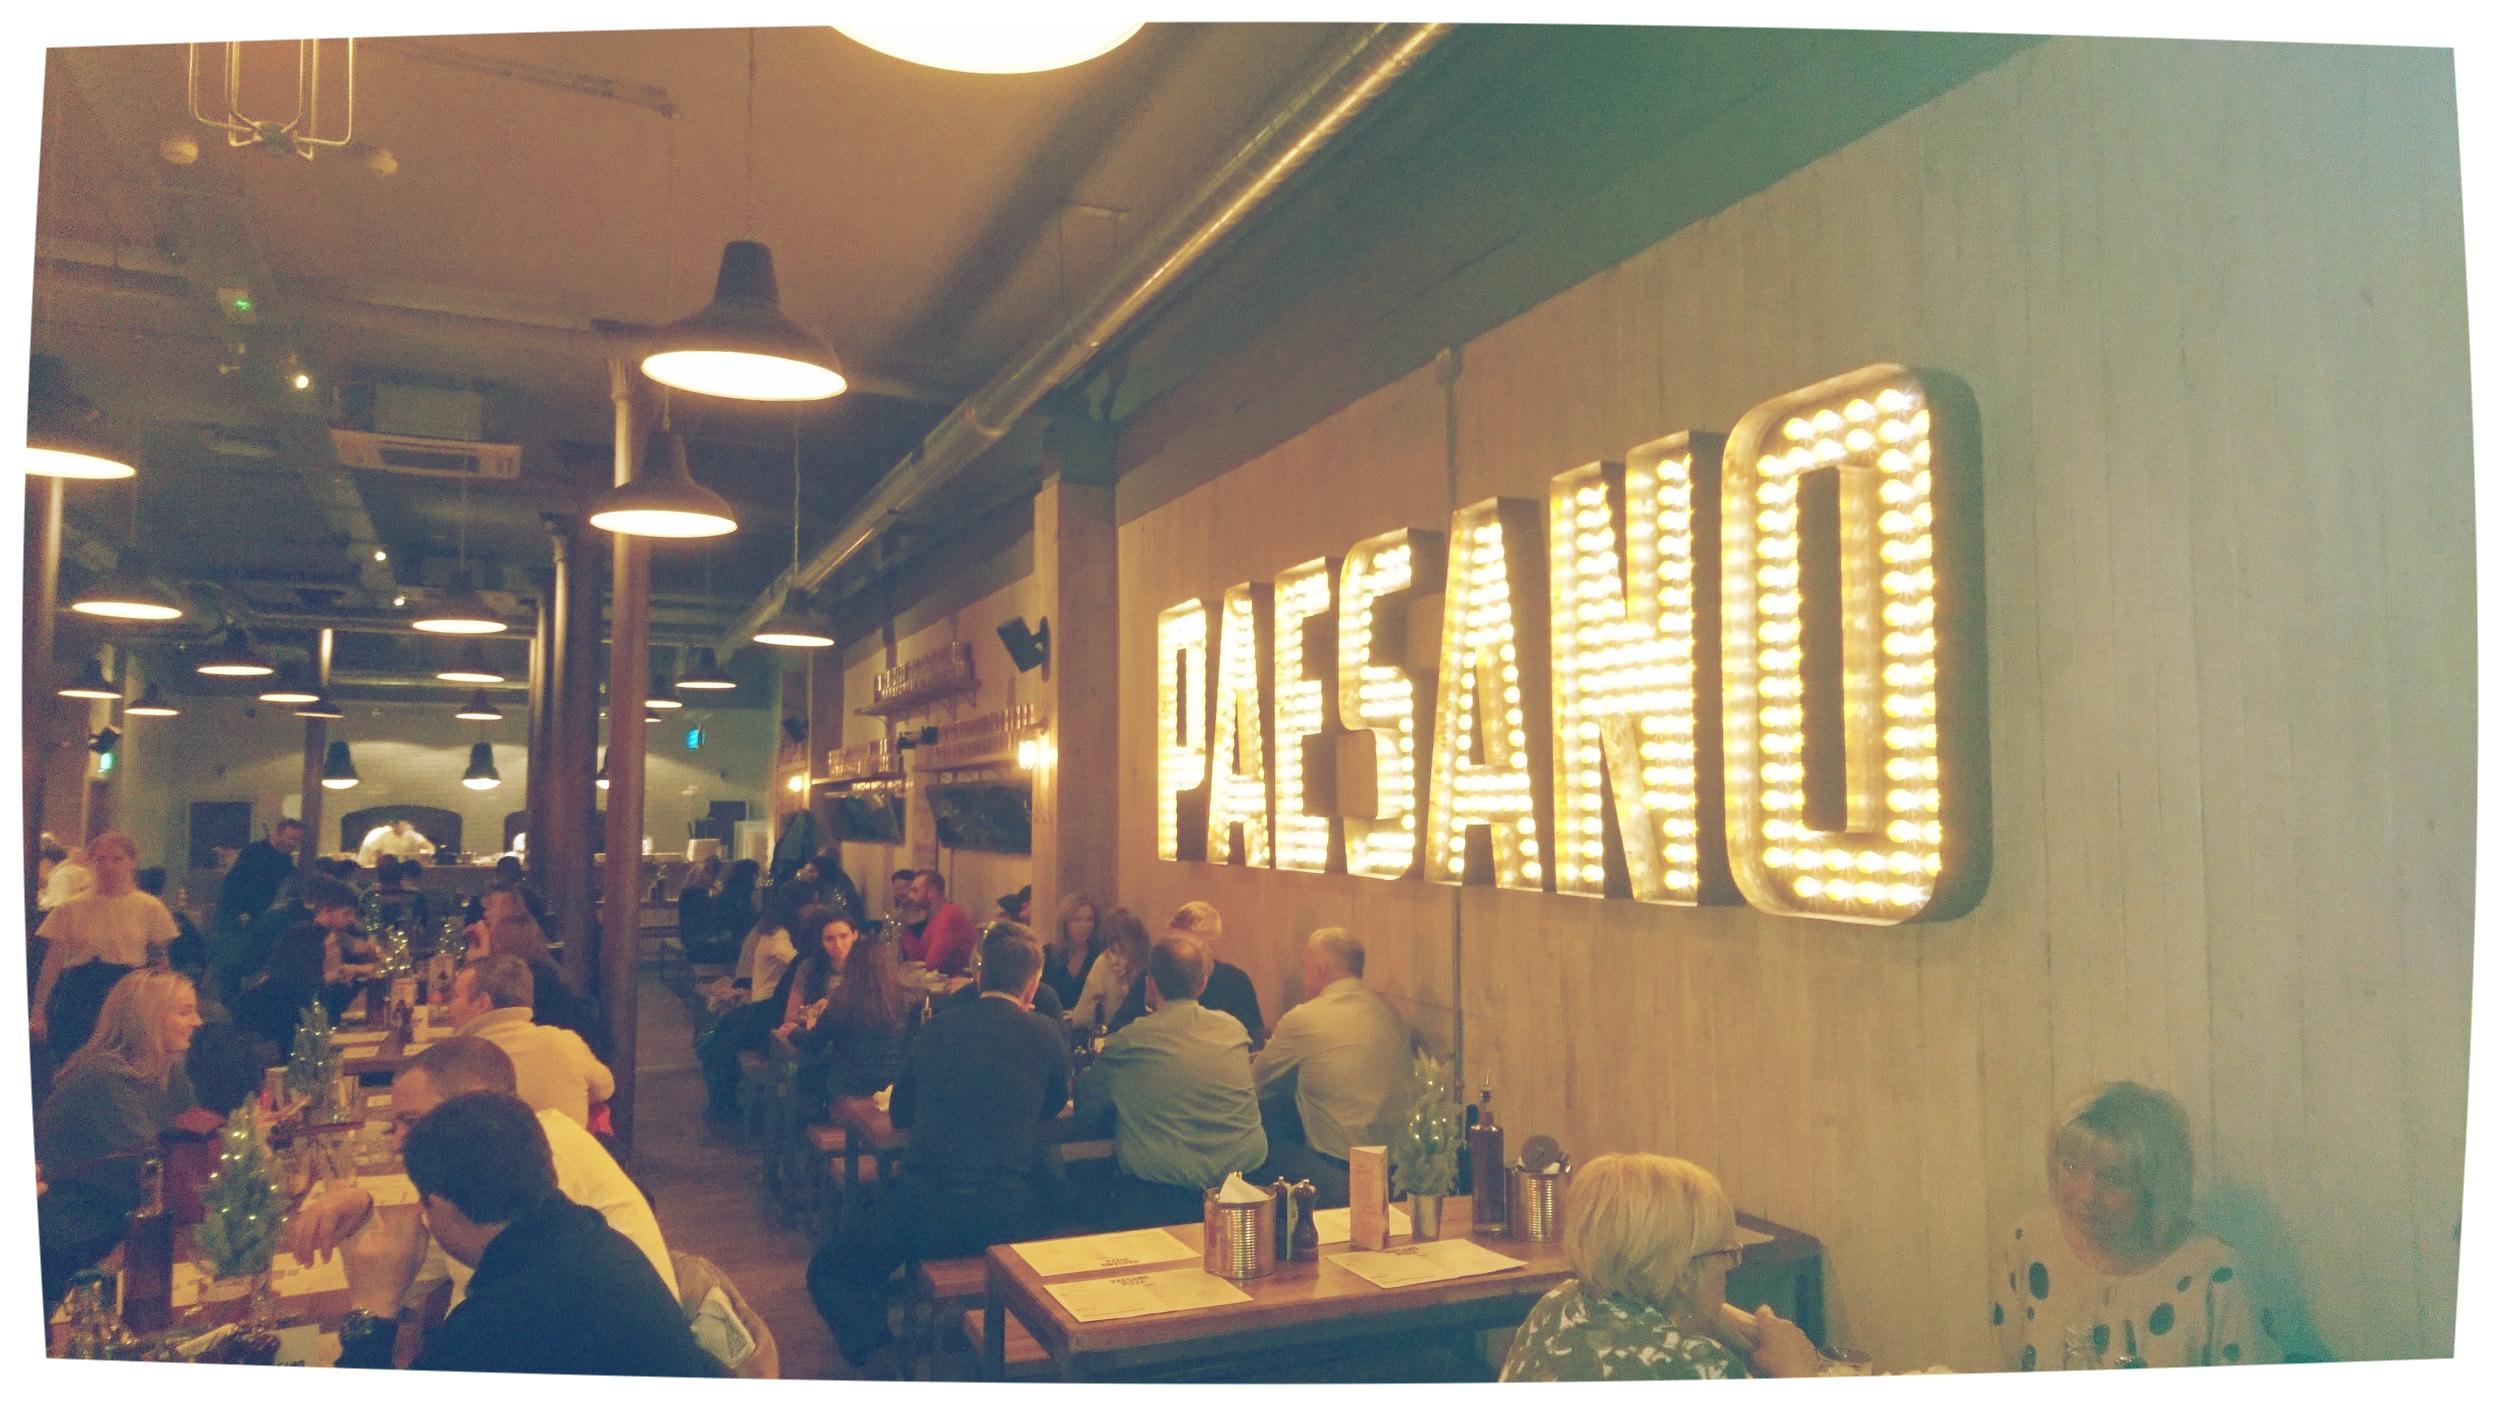 Paesano Pizza 94 Miller St Glasgow G1 1dt Scottish Food